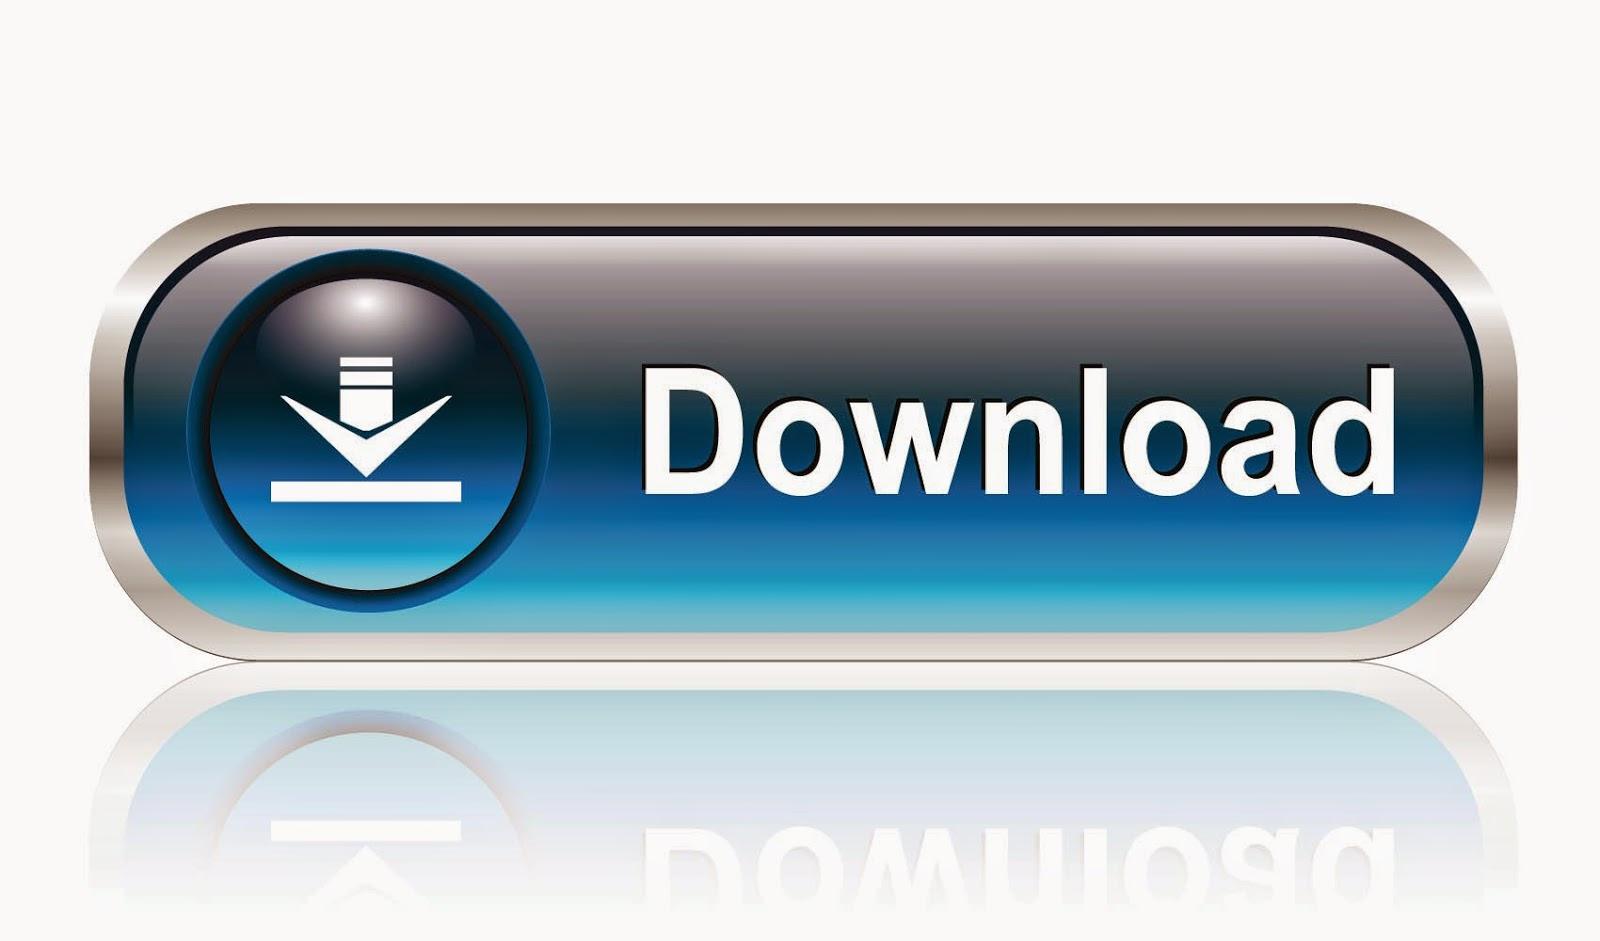 "<img src=""http://2.bp.blogspot.com/-BW8VJ7Sbkdg/U2e4vNSTtYI/AAAAAAAAChk/ZjvGbk9Qu1U/s1600/Ivy-Gallery-all-photos-in-one.jpg"" alt=""Ivy Gallery Apk Free Download"" />"